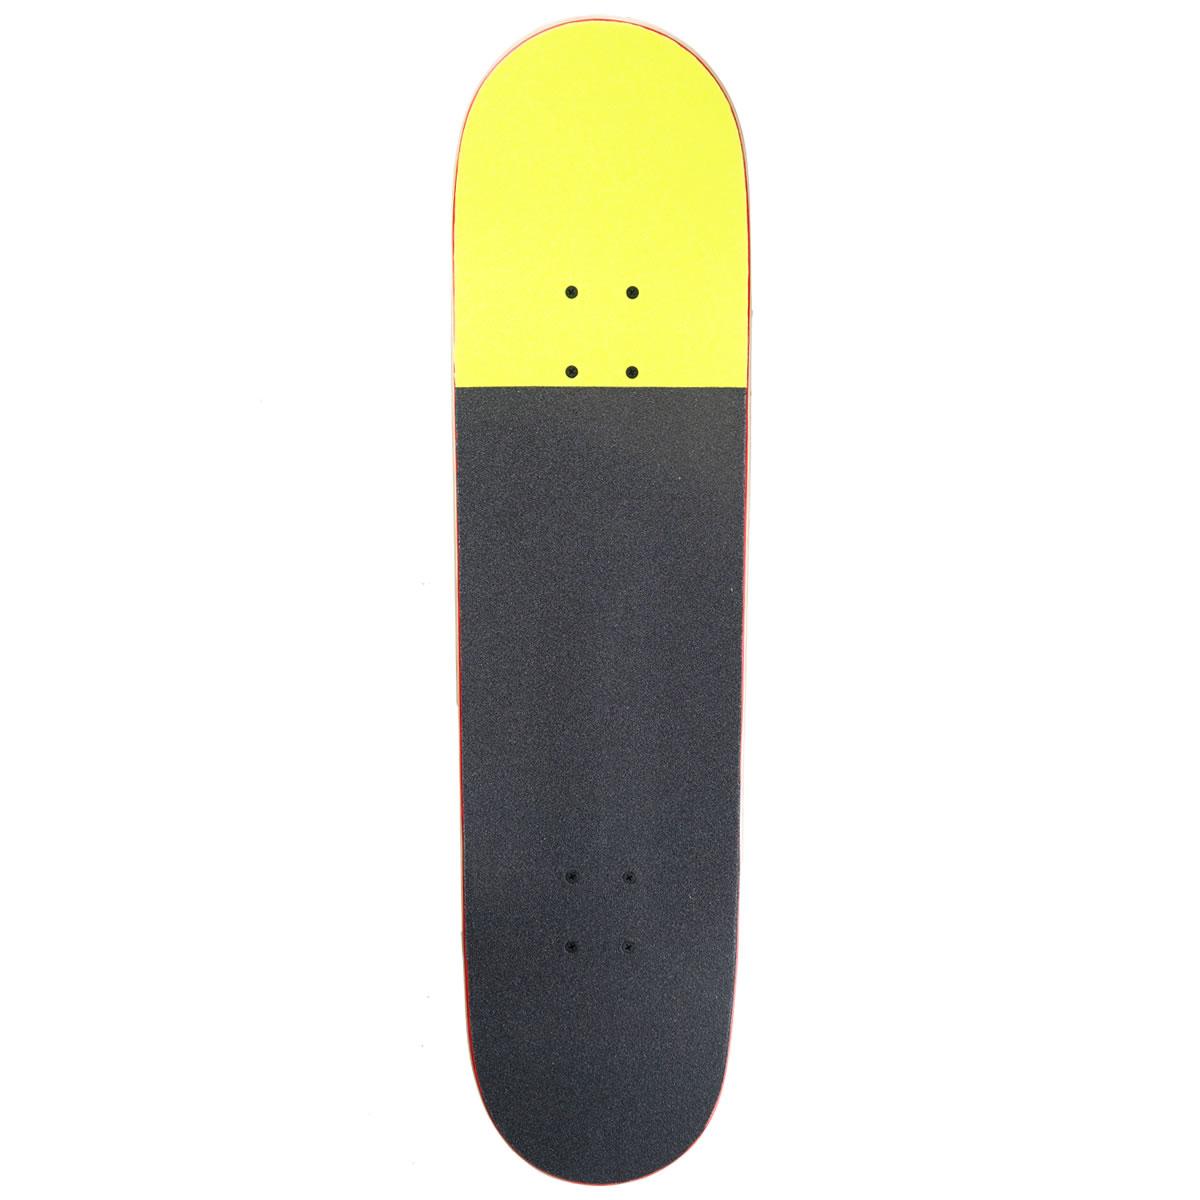 Shuvit-Skateboard-1-Top.jpg